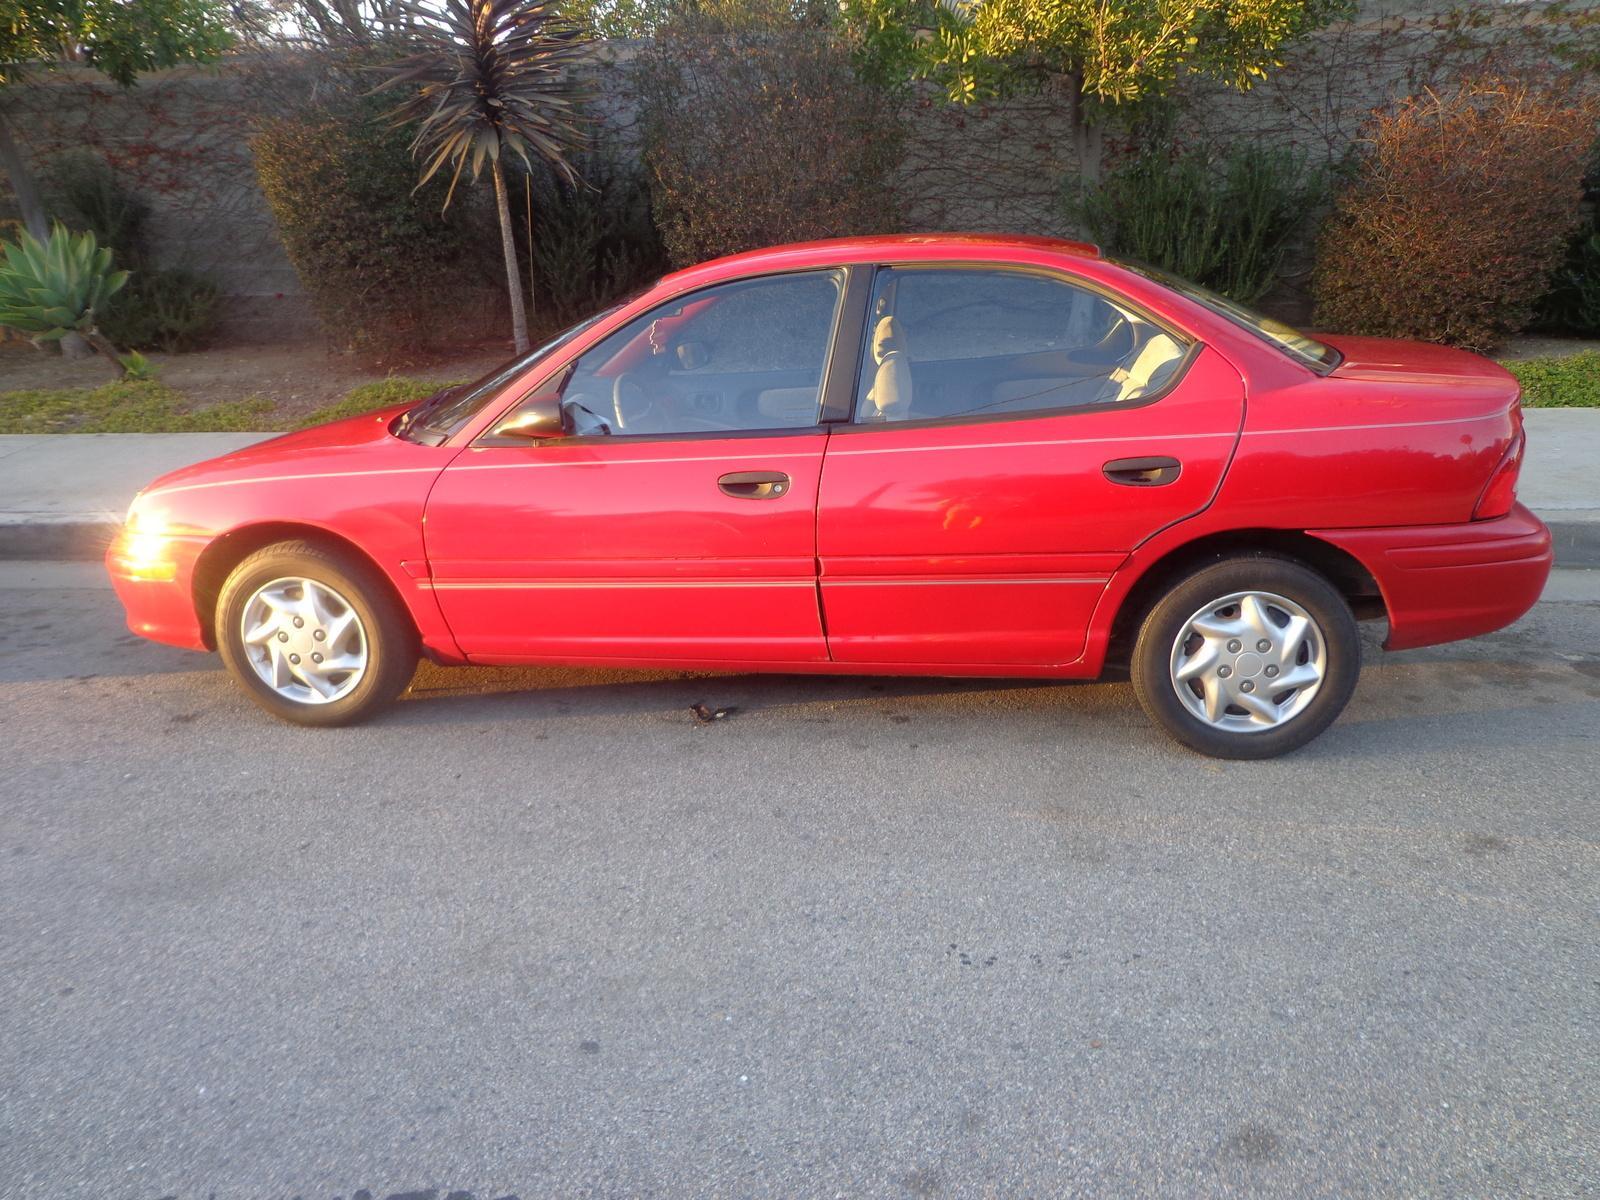 800 1024 1280 1600 origin 1997 Dodge Neon ...